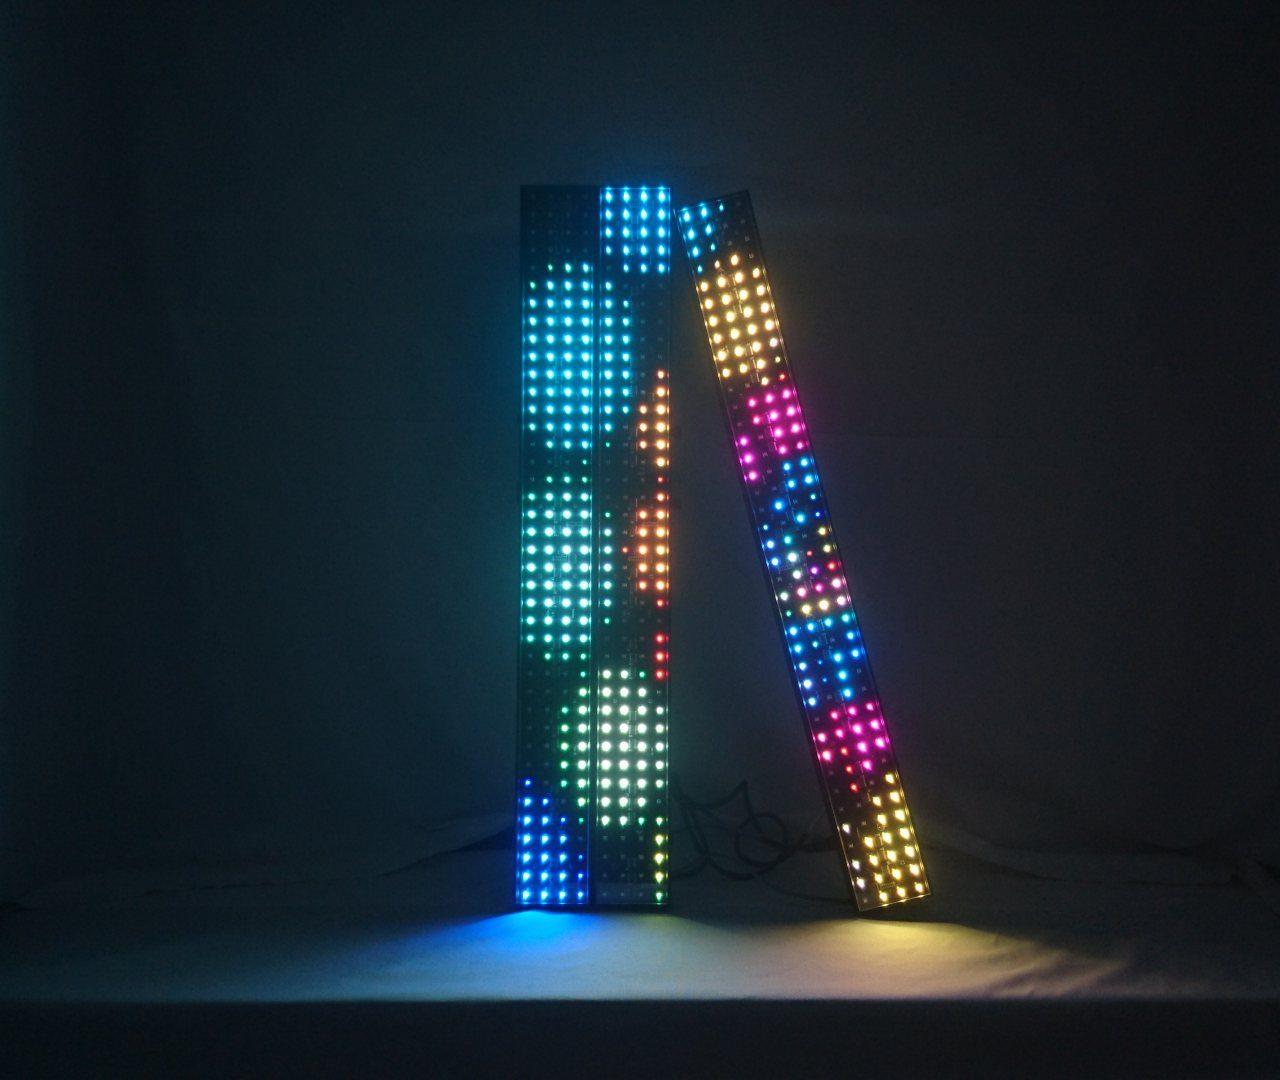 LED Pixel Bar (4x40) - LED Pixel Bar on kuin pieni ledinäyttö. Yhdessä elementissä on 160 pixeliä(4x40).